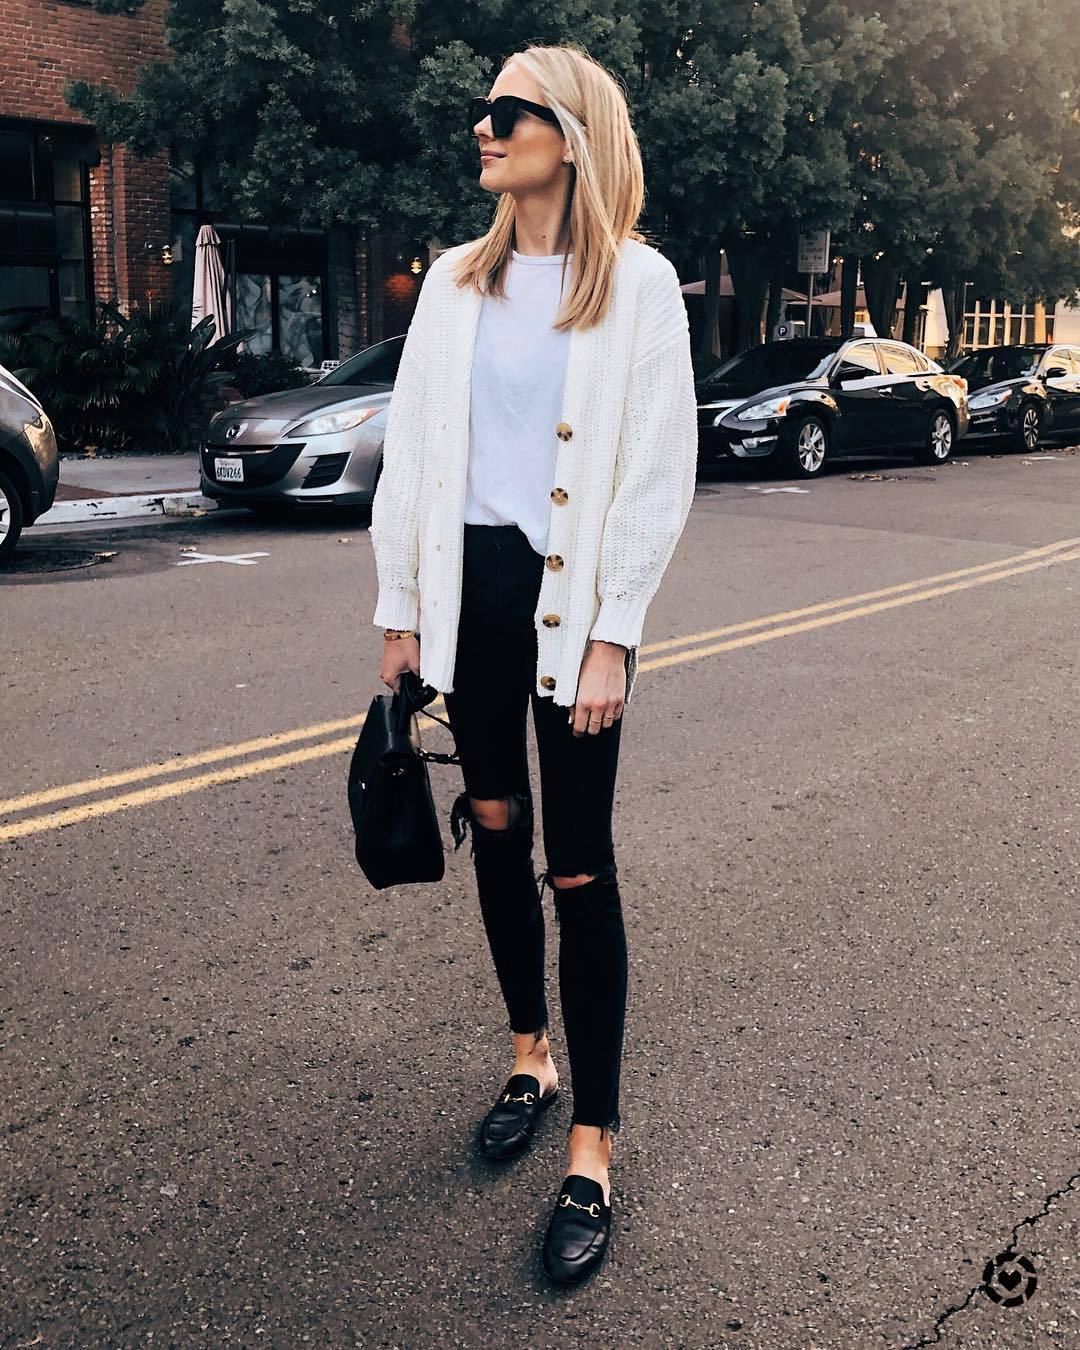 sweater cardigan mules black loafers black skinny jeans black ripped jeans black bag white t-shirt black sunglasses